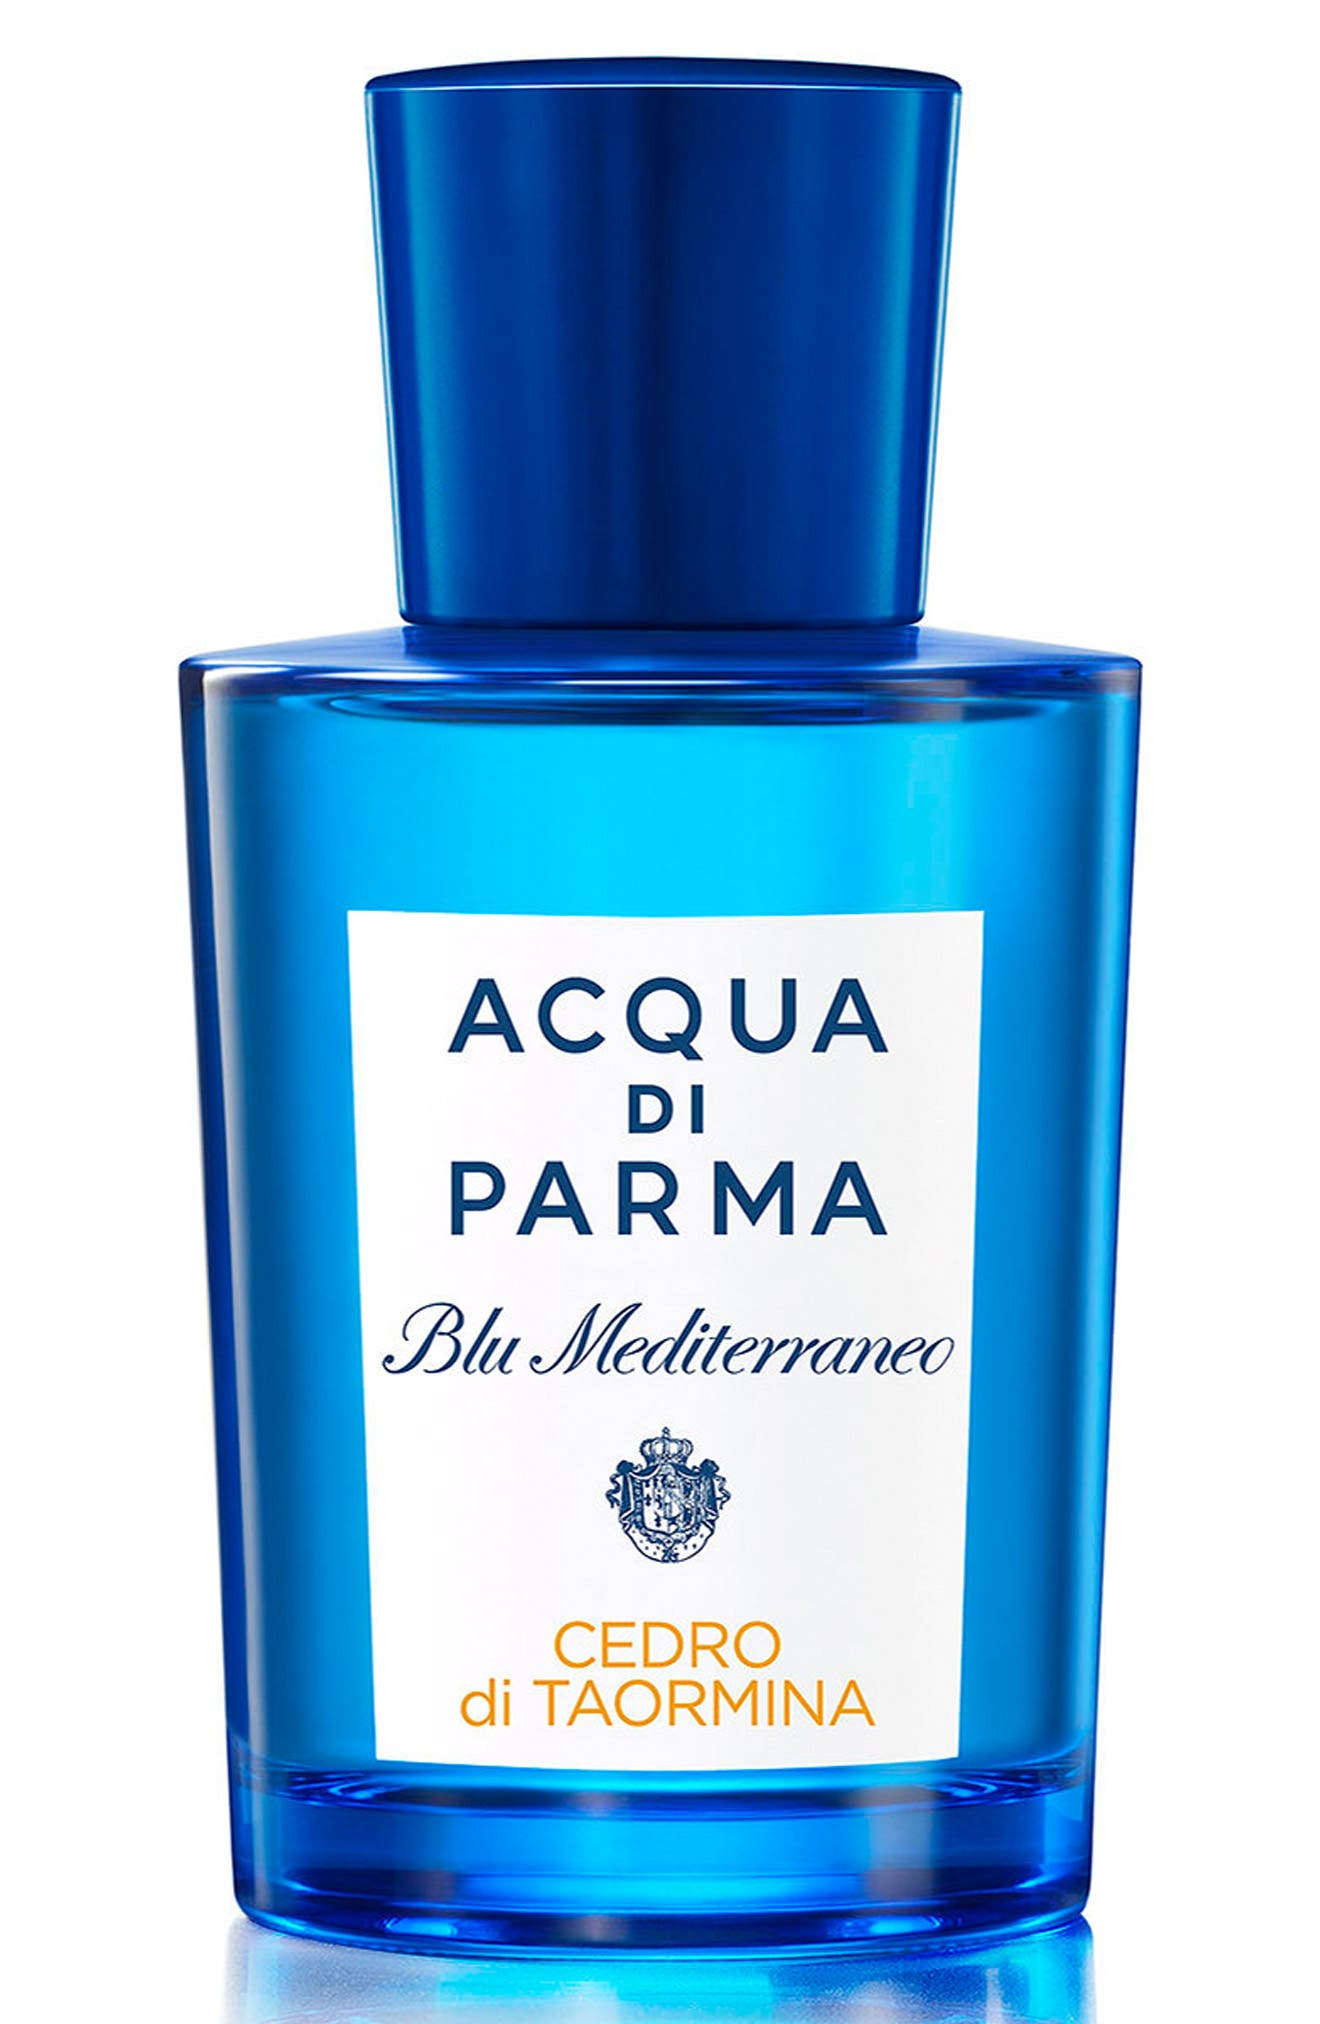 Alternate Image 2  - Acqua di Parma 'Blu Mediterraneo Cedro di Taormina' Eau de Toilette